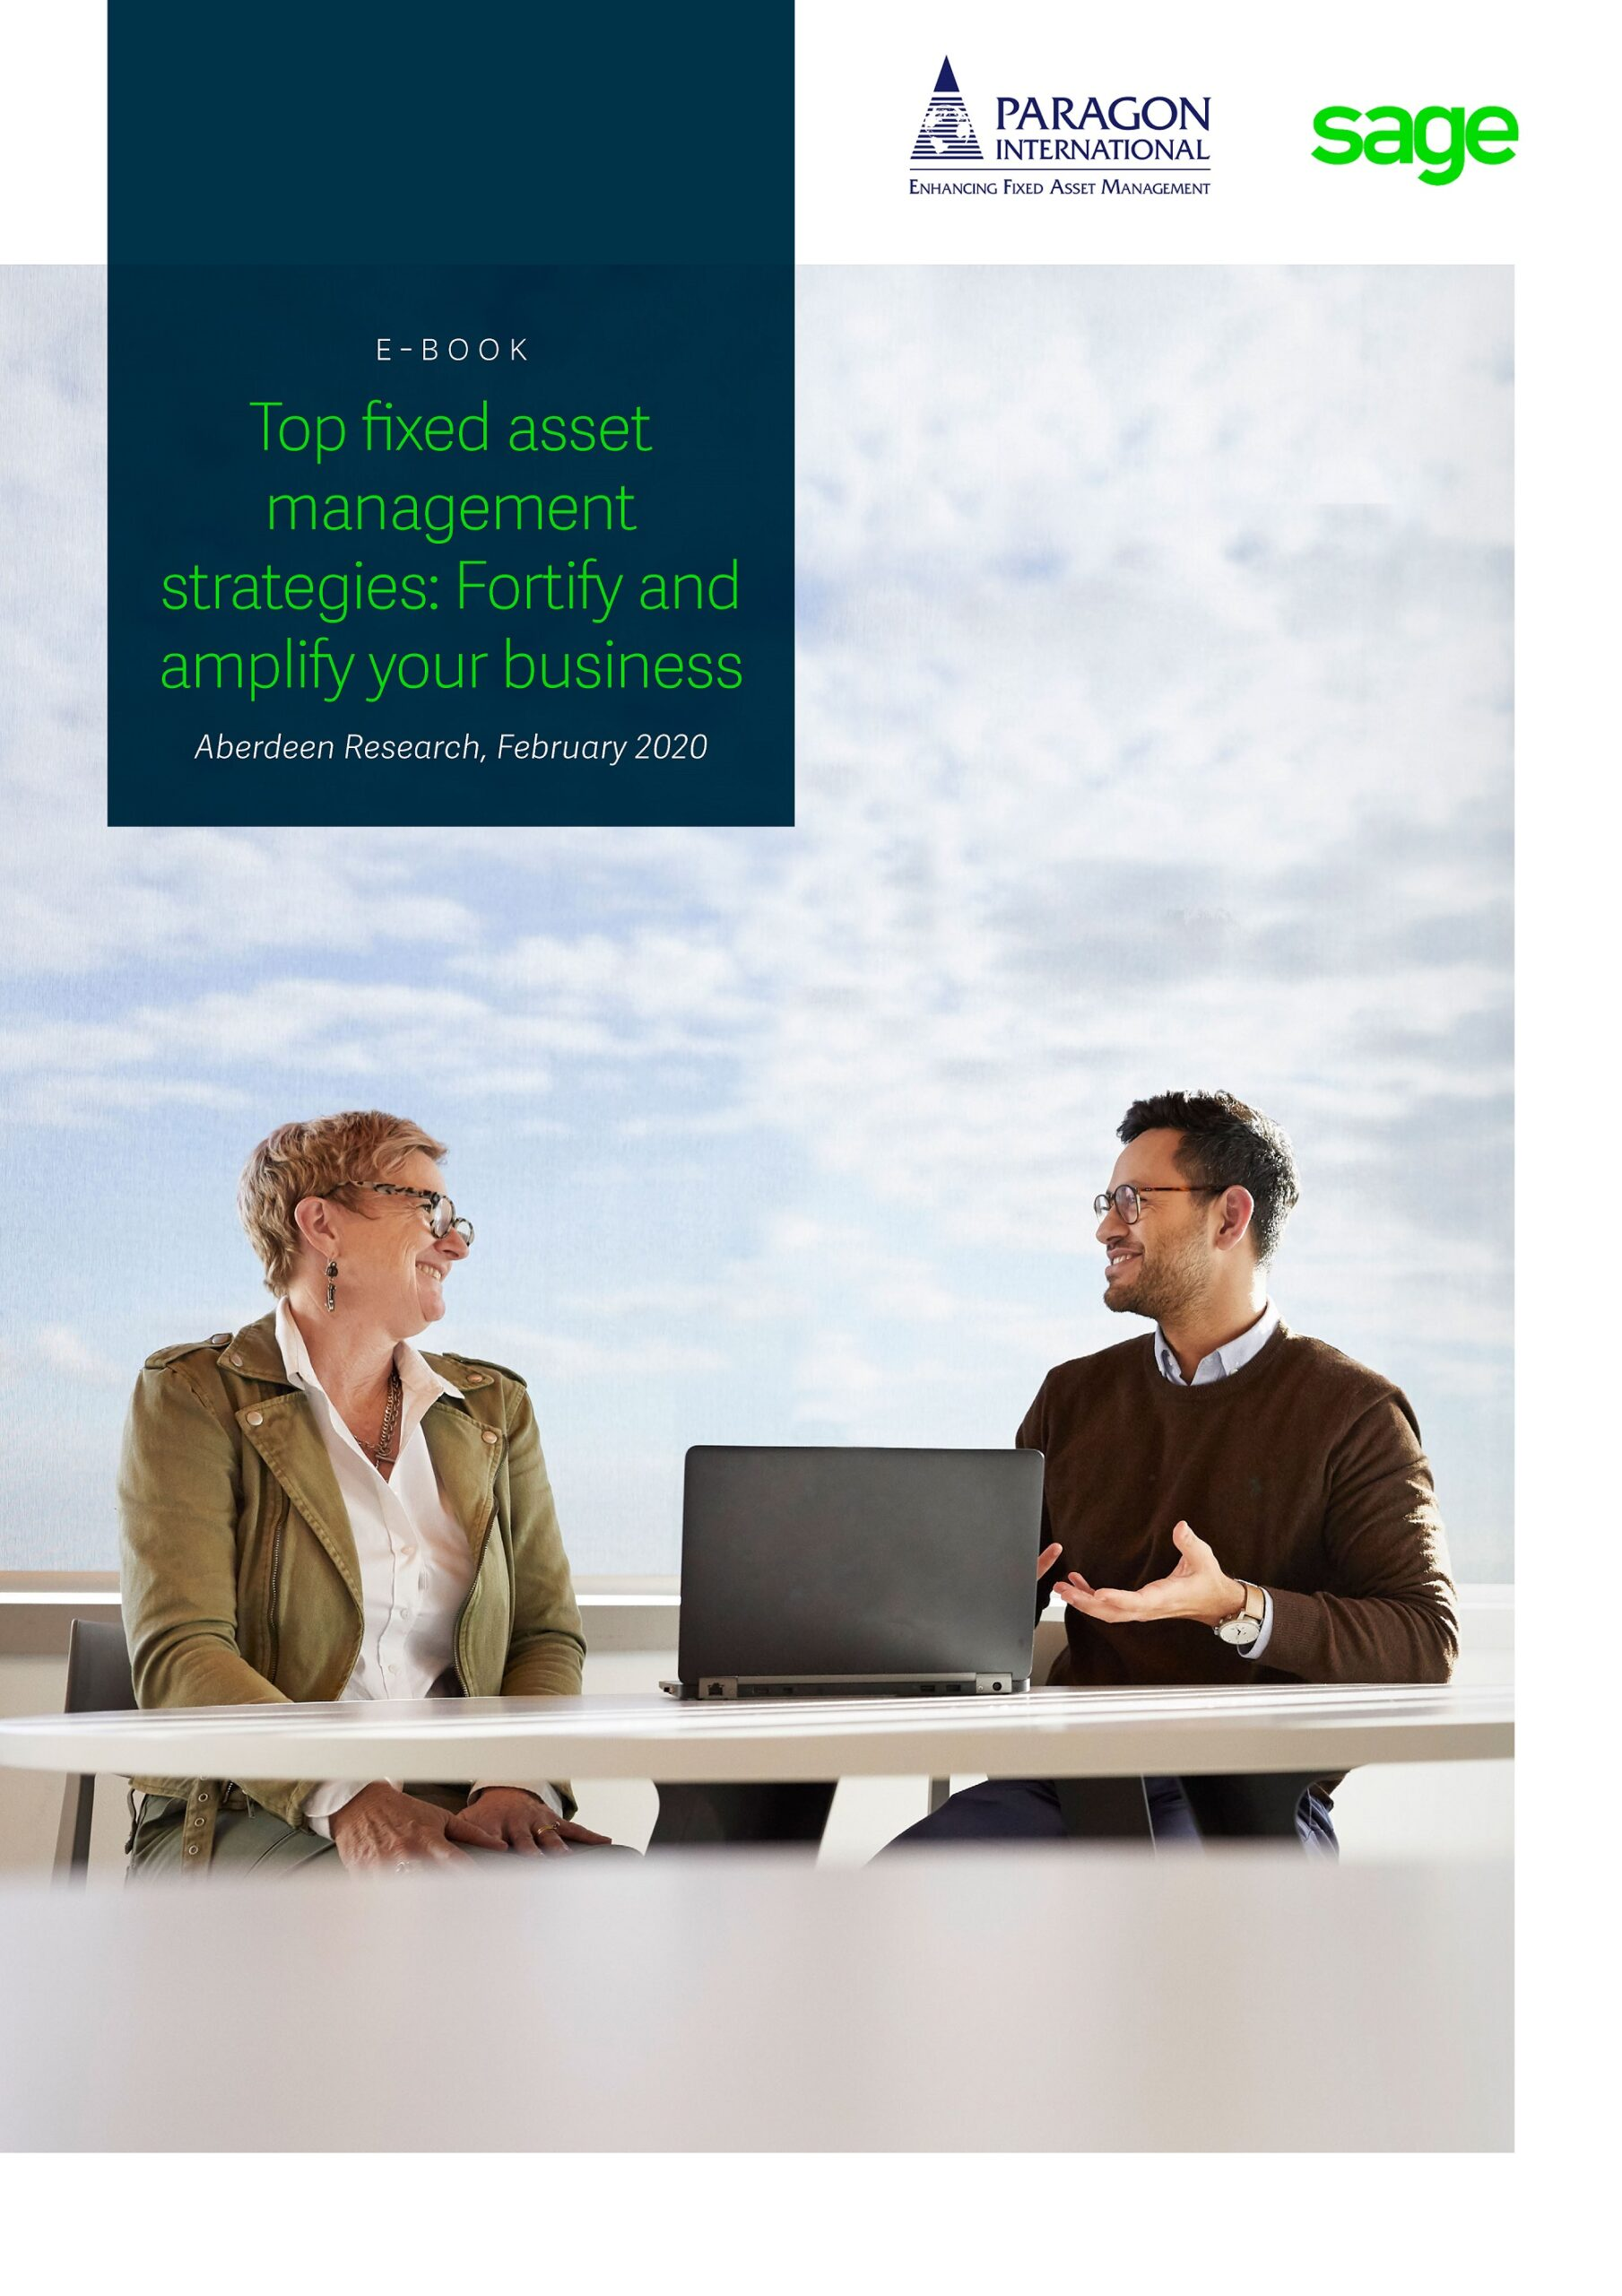 Top Fixed Asset Management Strategies